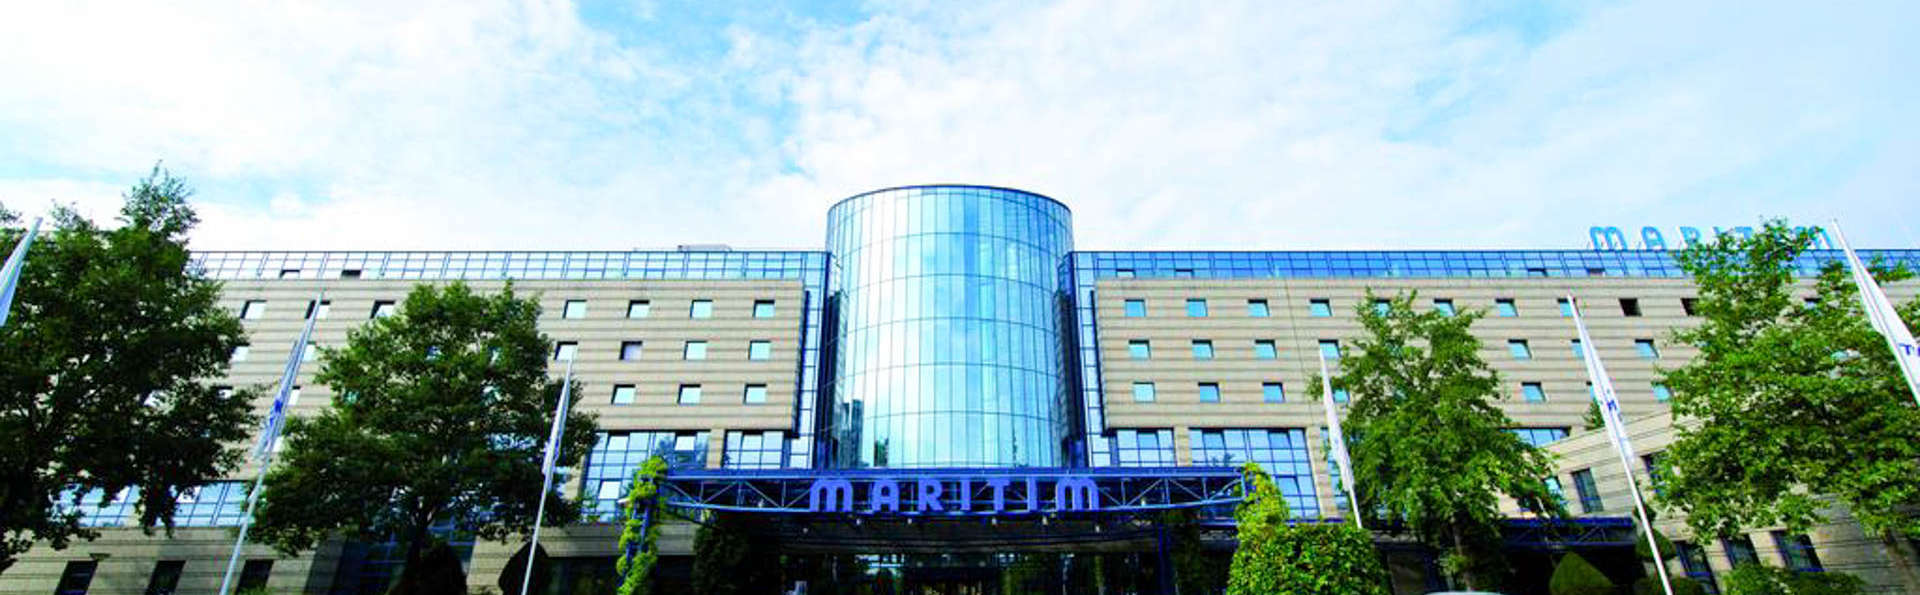 Maritim Hotel Bonn - EDIT_WEB_FRONT2.jpg